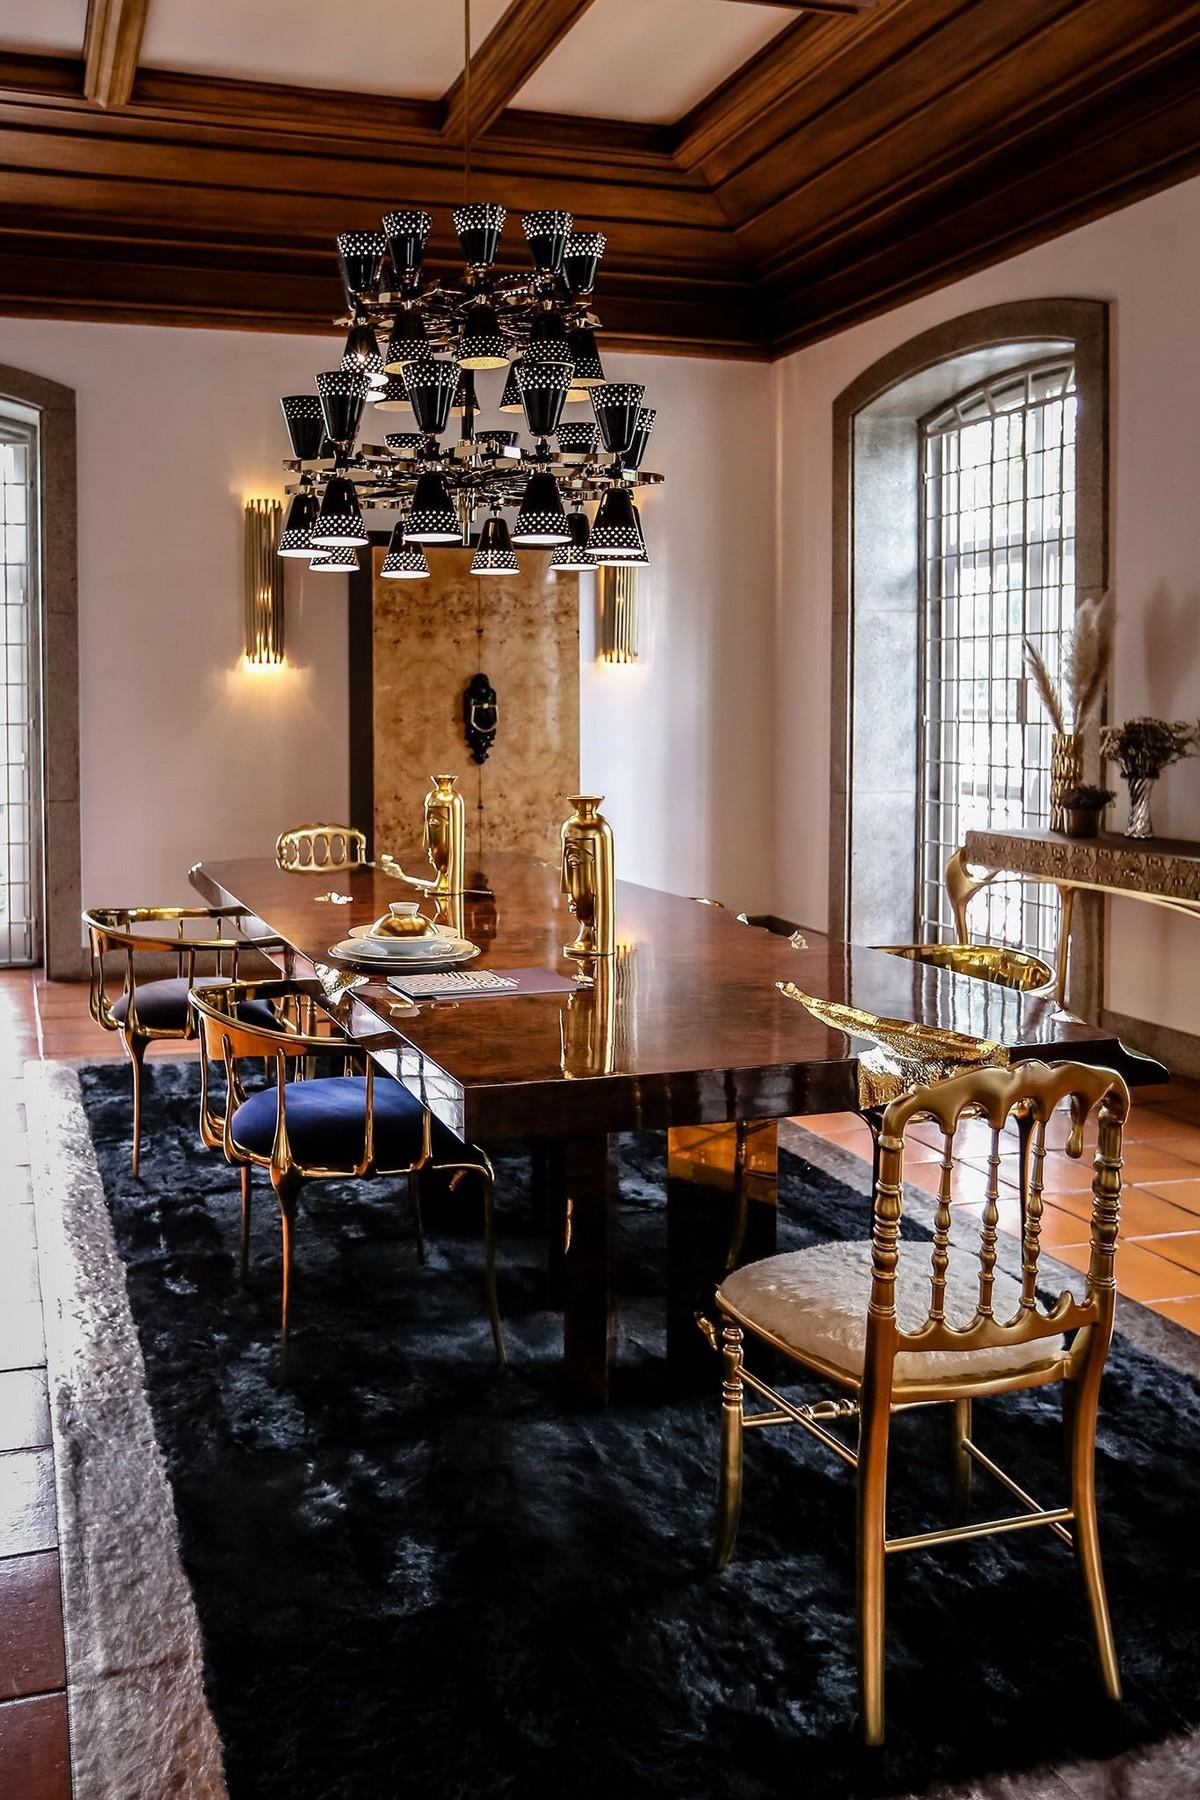 Exclusive Design: Top Rectangular Dining Tables rectangular dining tables Exclusive Design: Top Rectangular Dining Tables empire